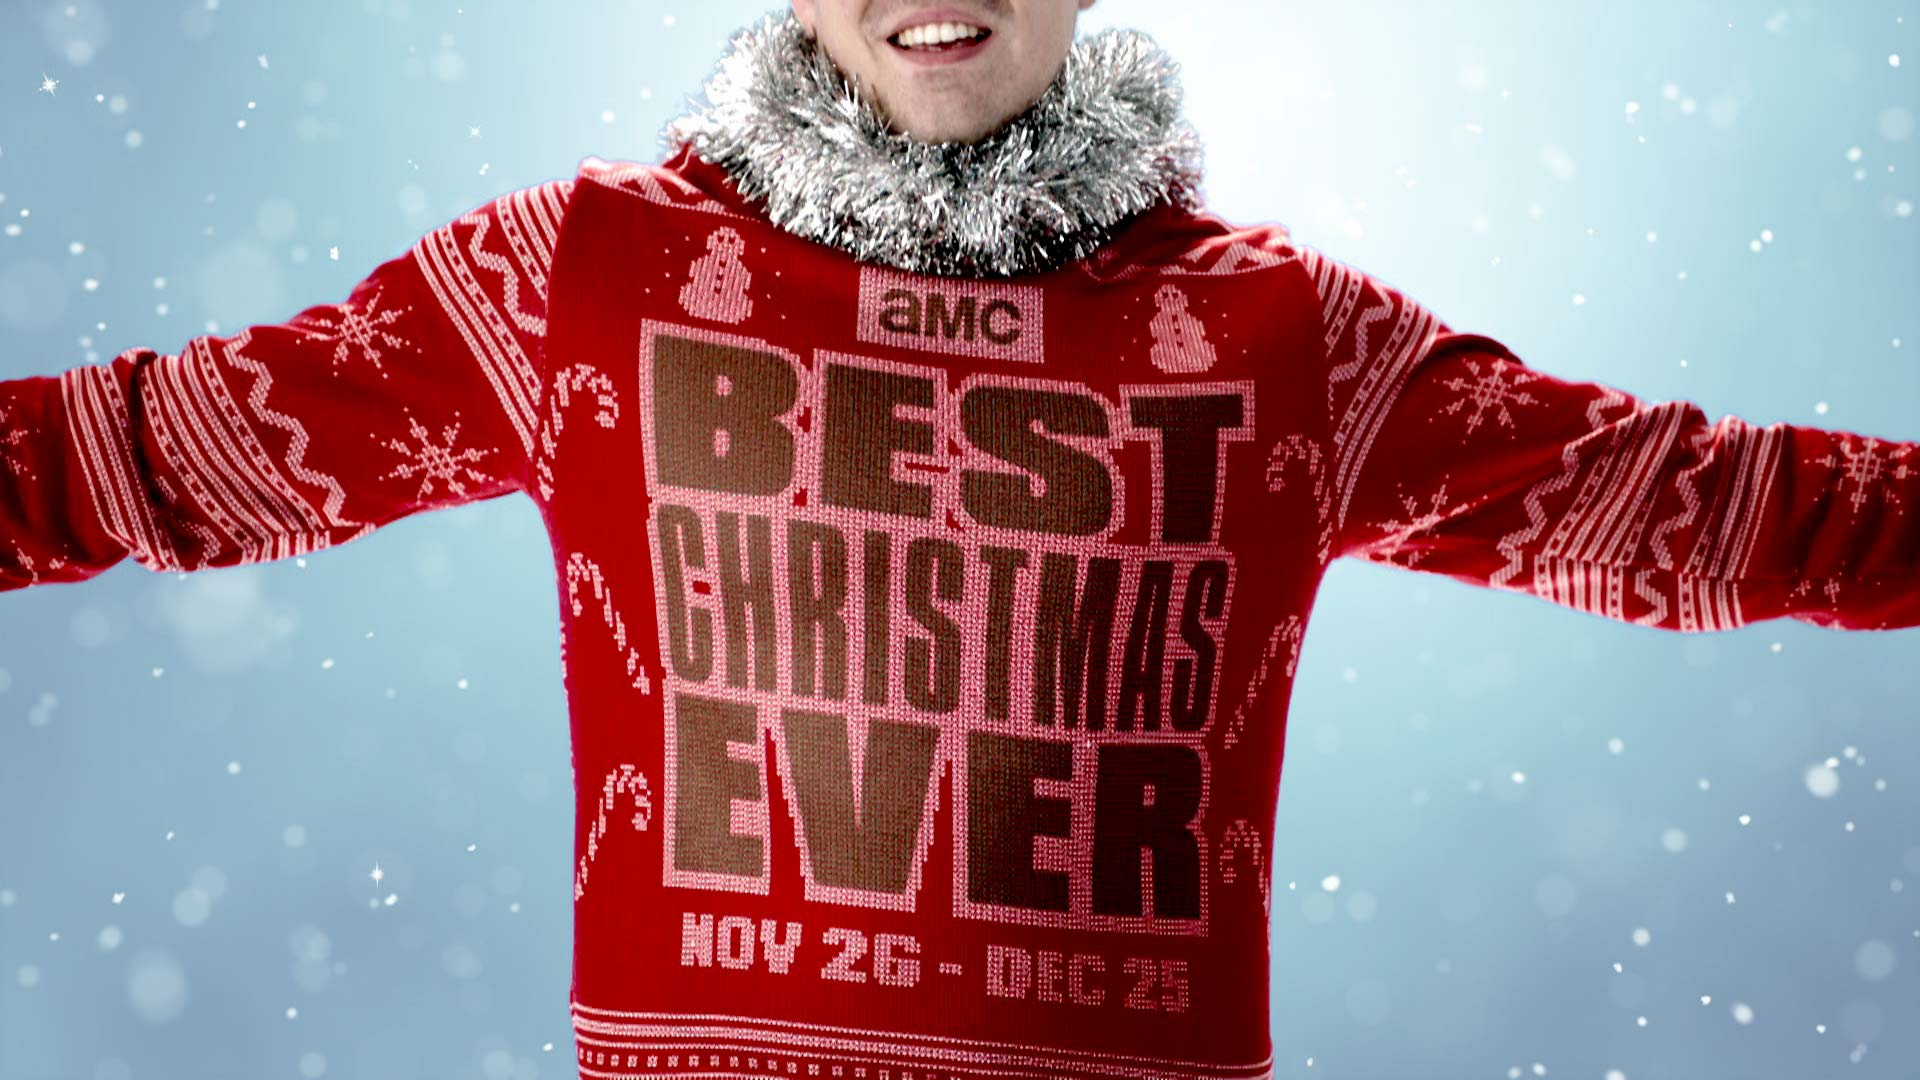 Amc Christmas Schedule 2020 AMC Best Christmas Ever Teaser